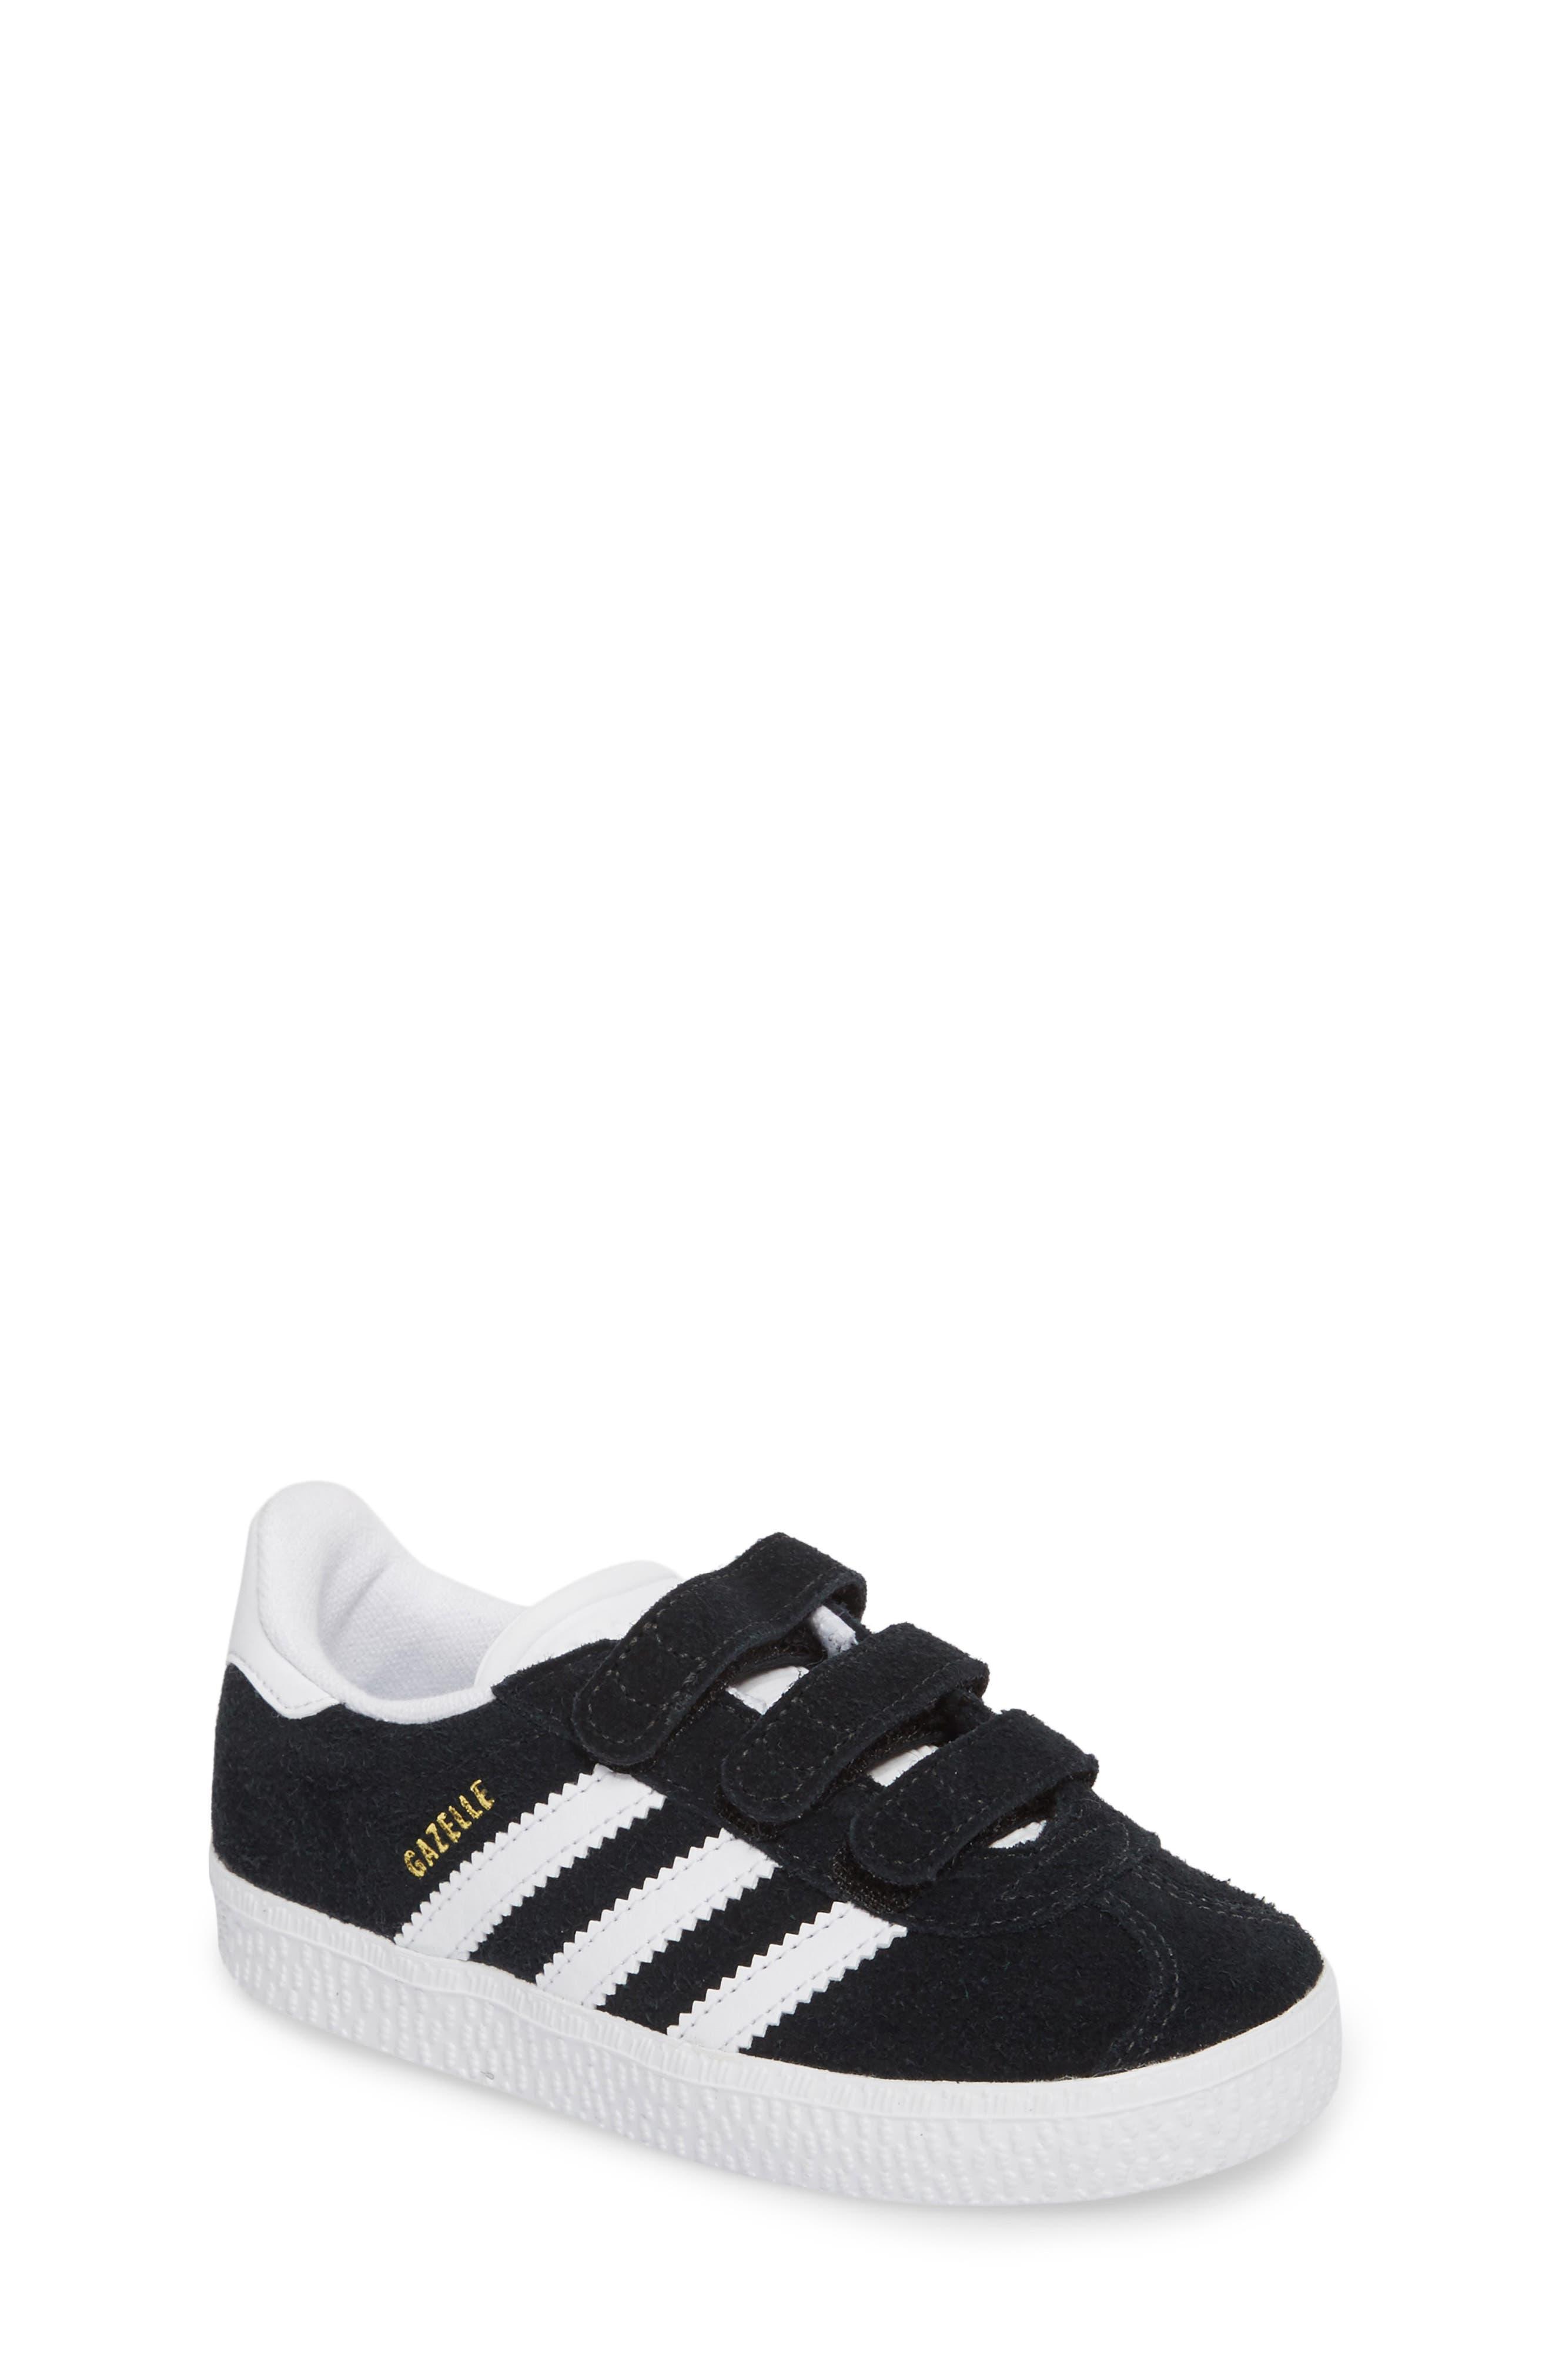 Gazelle Sneaker,                             Main thumbnail 1, color,                             Core Black / White / White